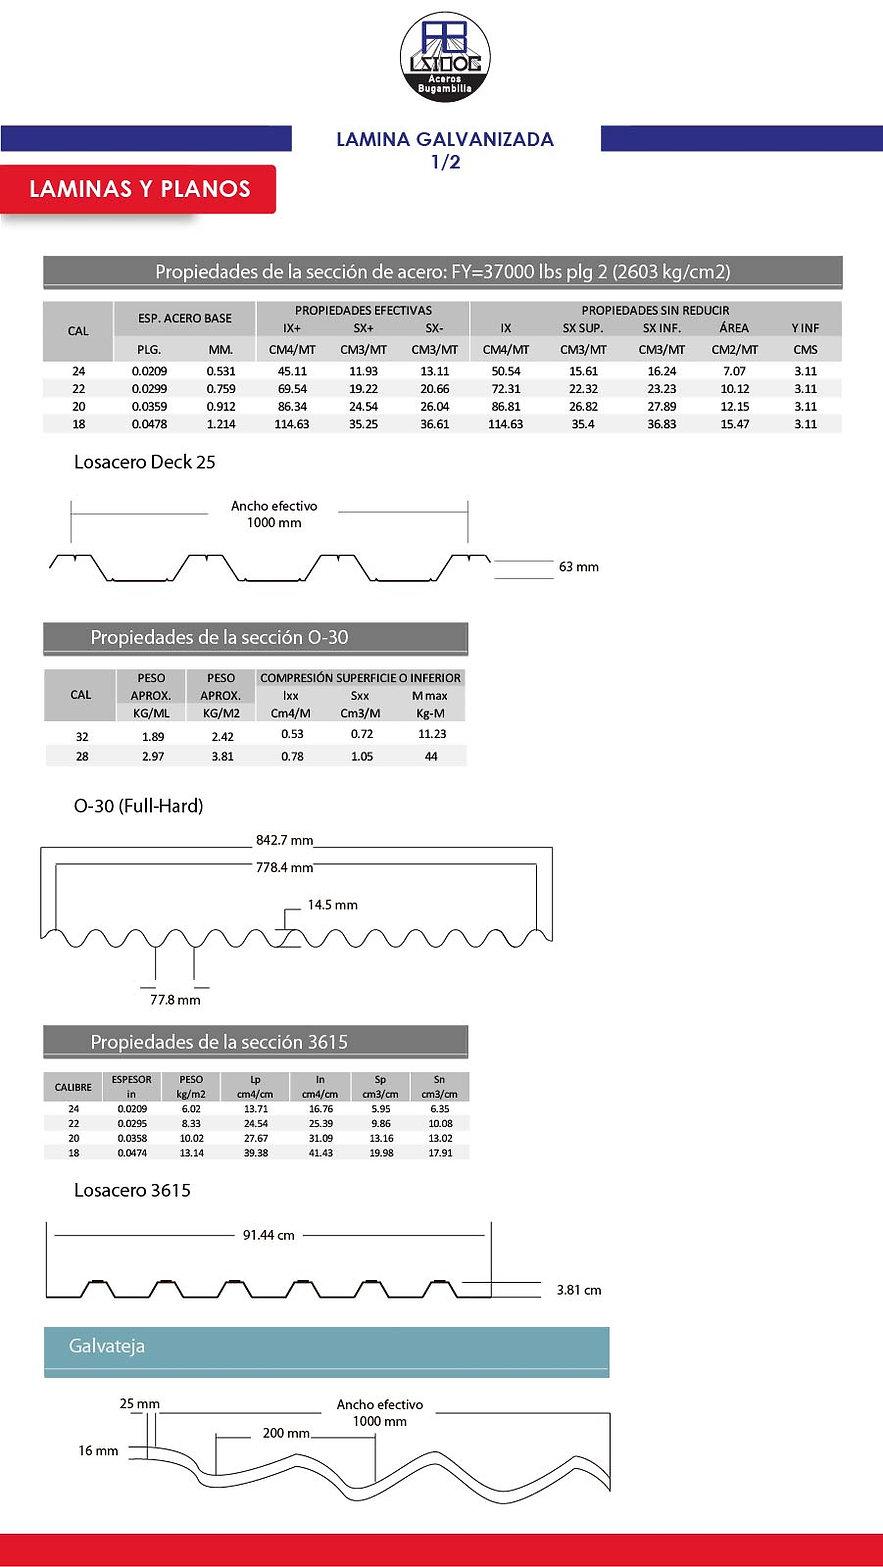 TABLAS WEB 3.0_LAMINA GALVANIZADA 1-2 (1